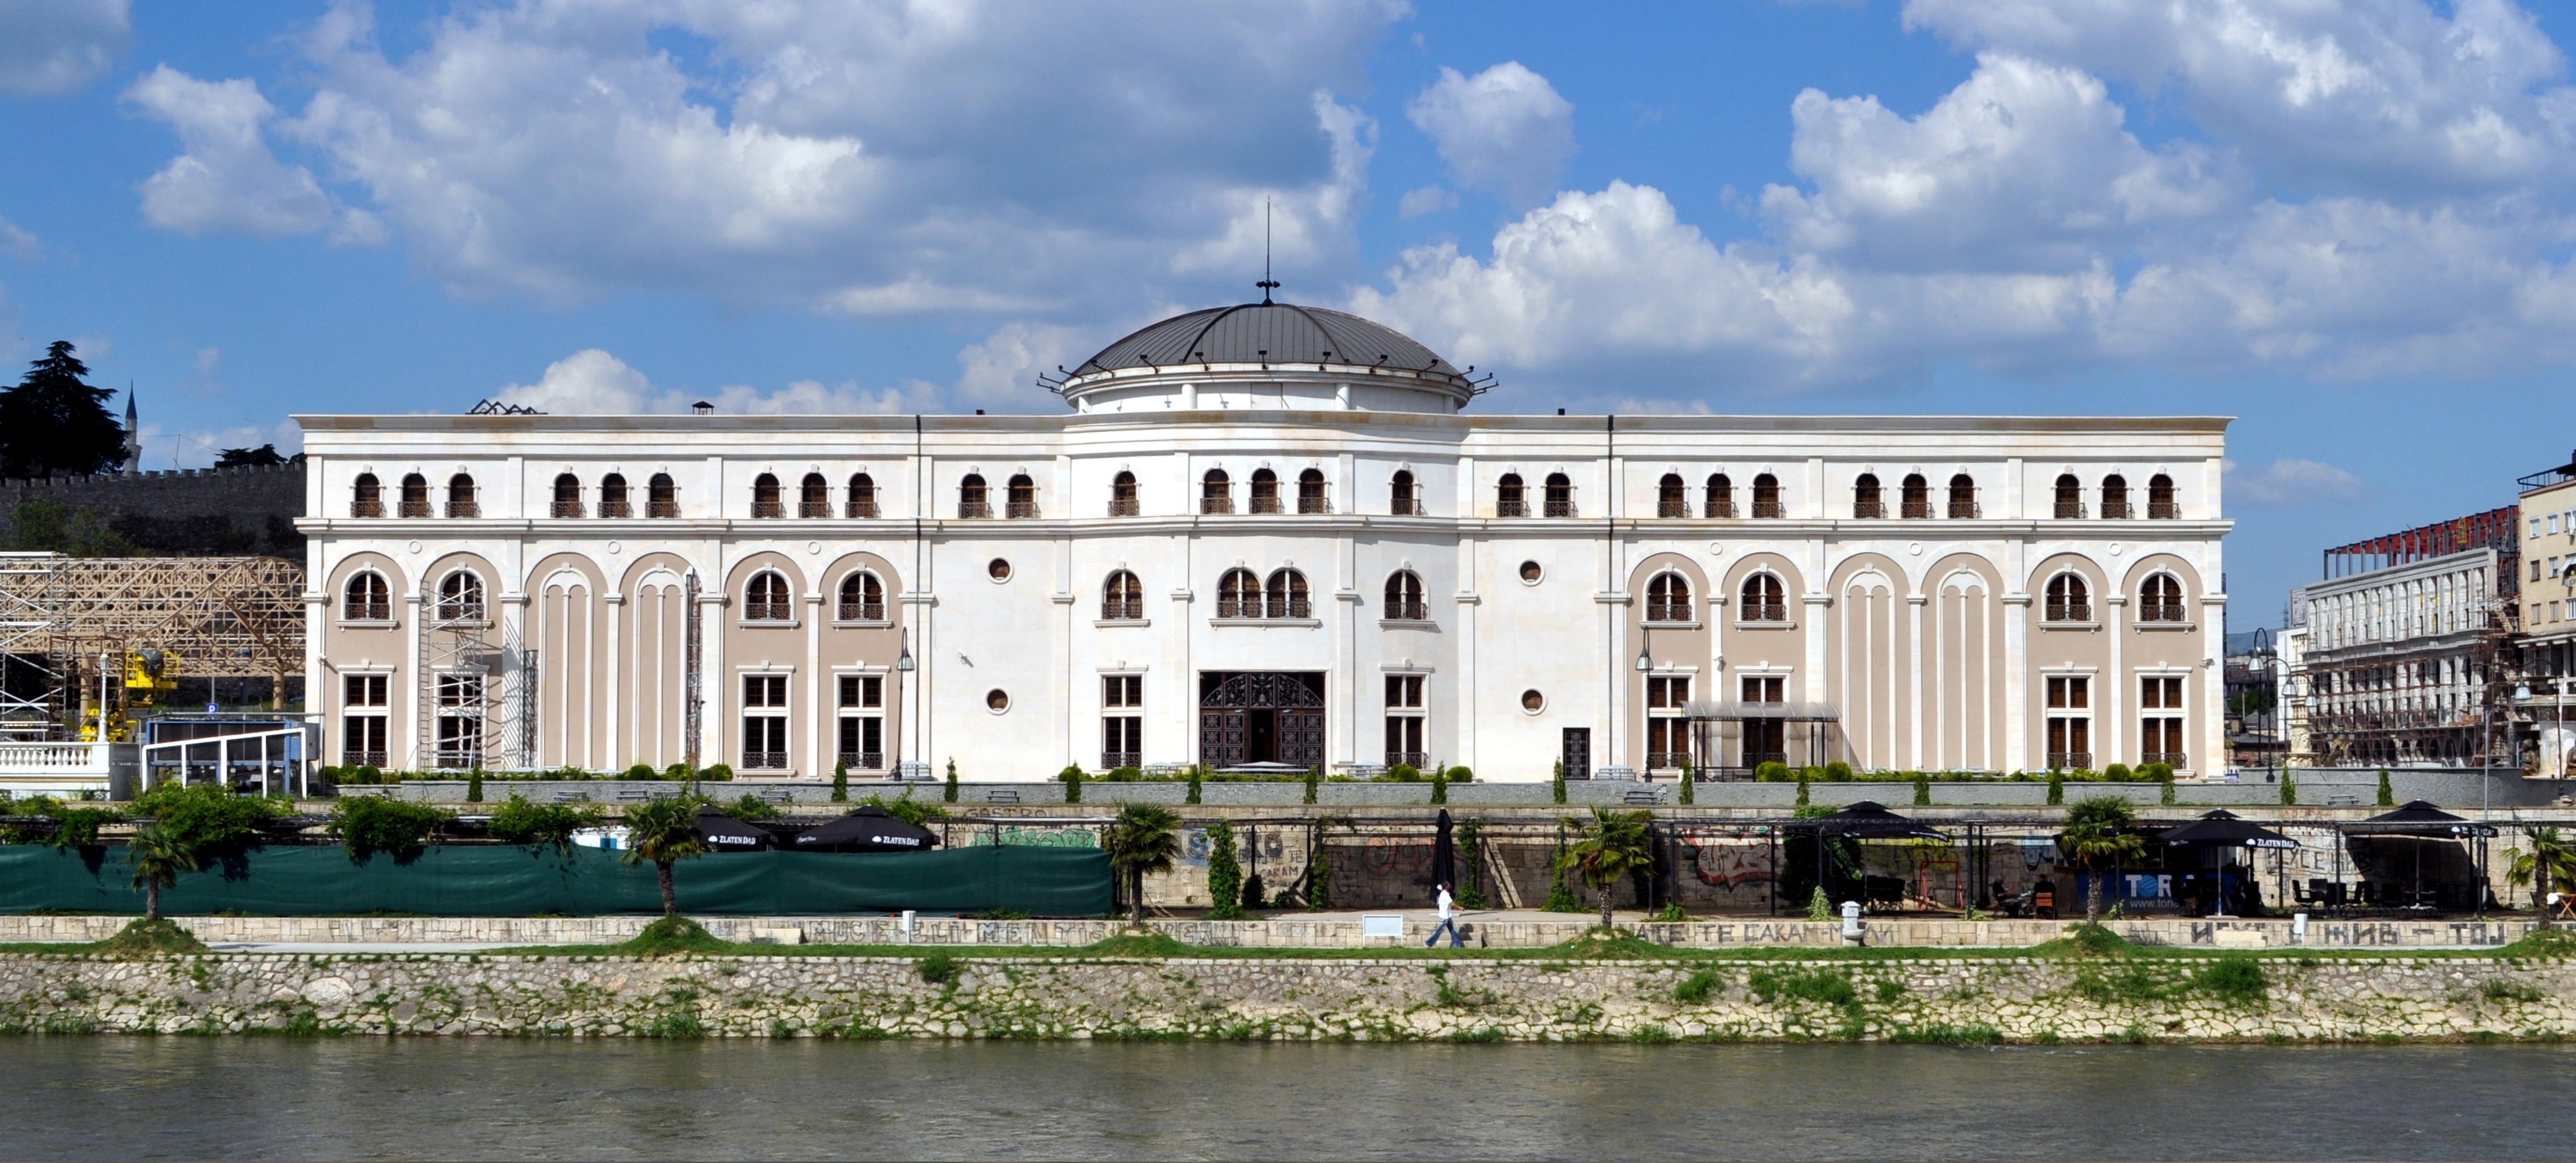 File:Skopje - Museum of the Macedonian Struggle.jpg ...